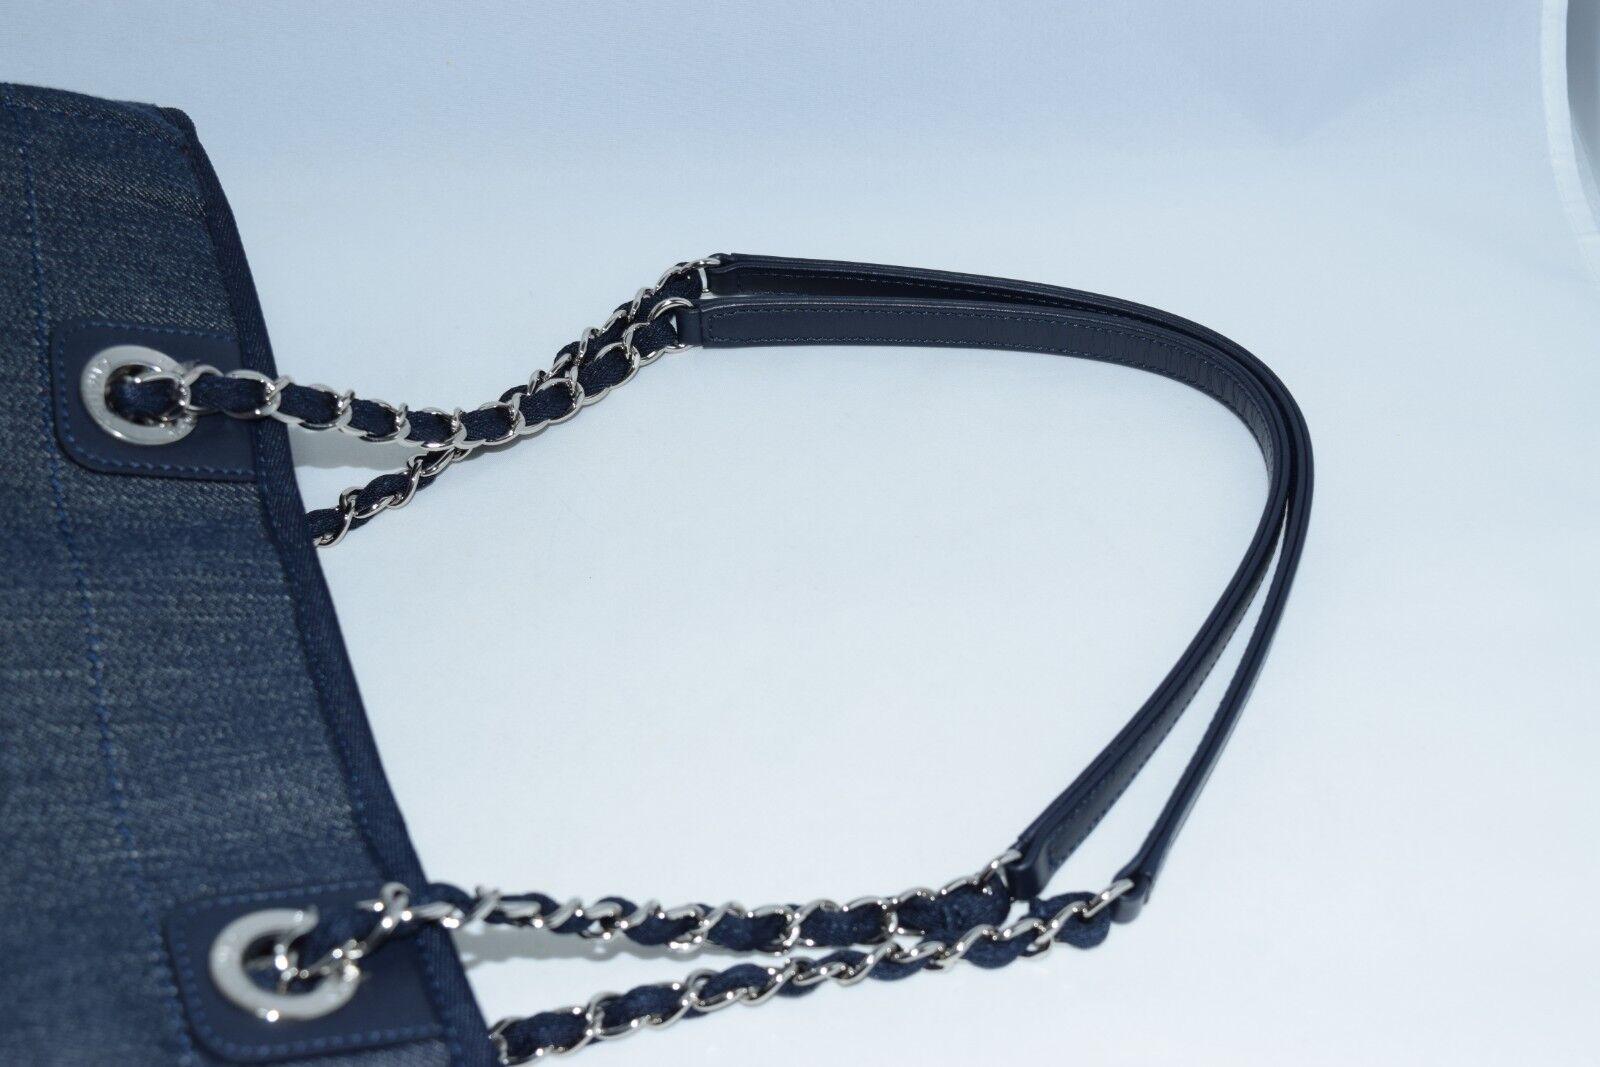 Chanel deauville sac bandoulière bleu denim chaîne sac à main neuf